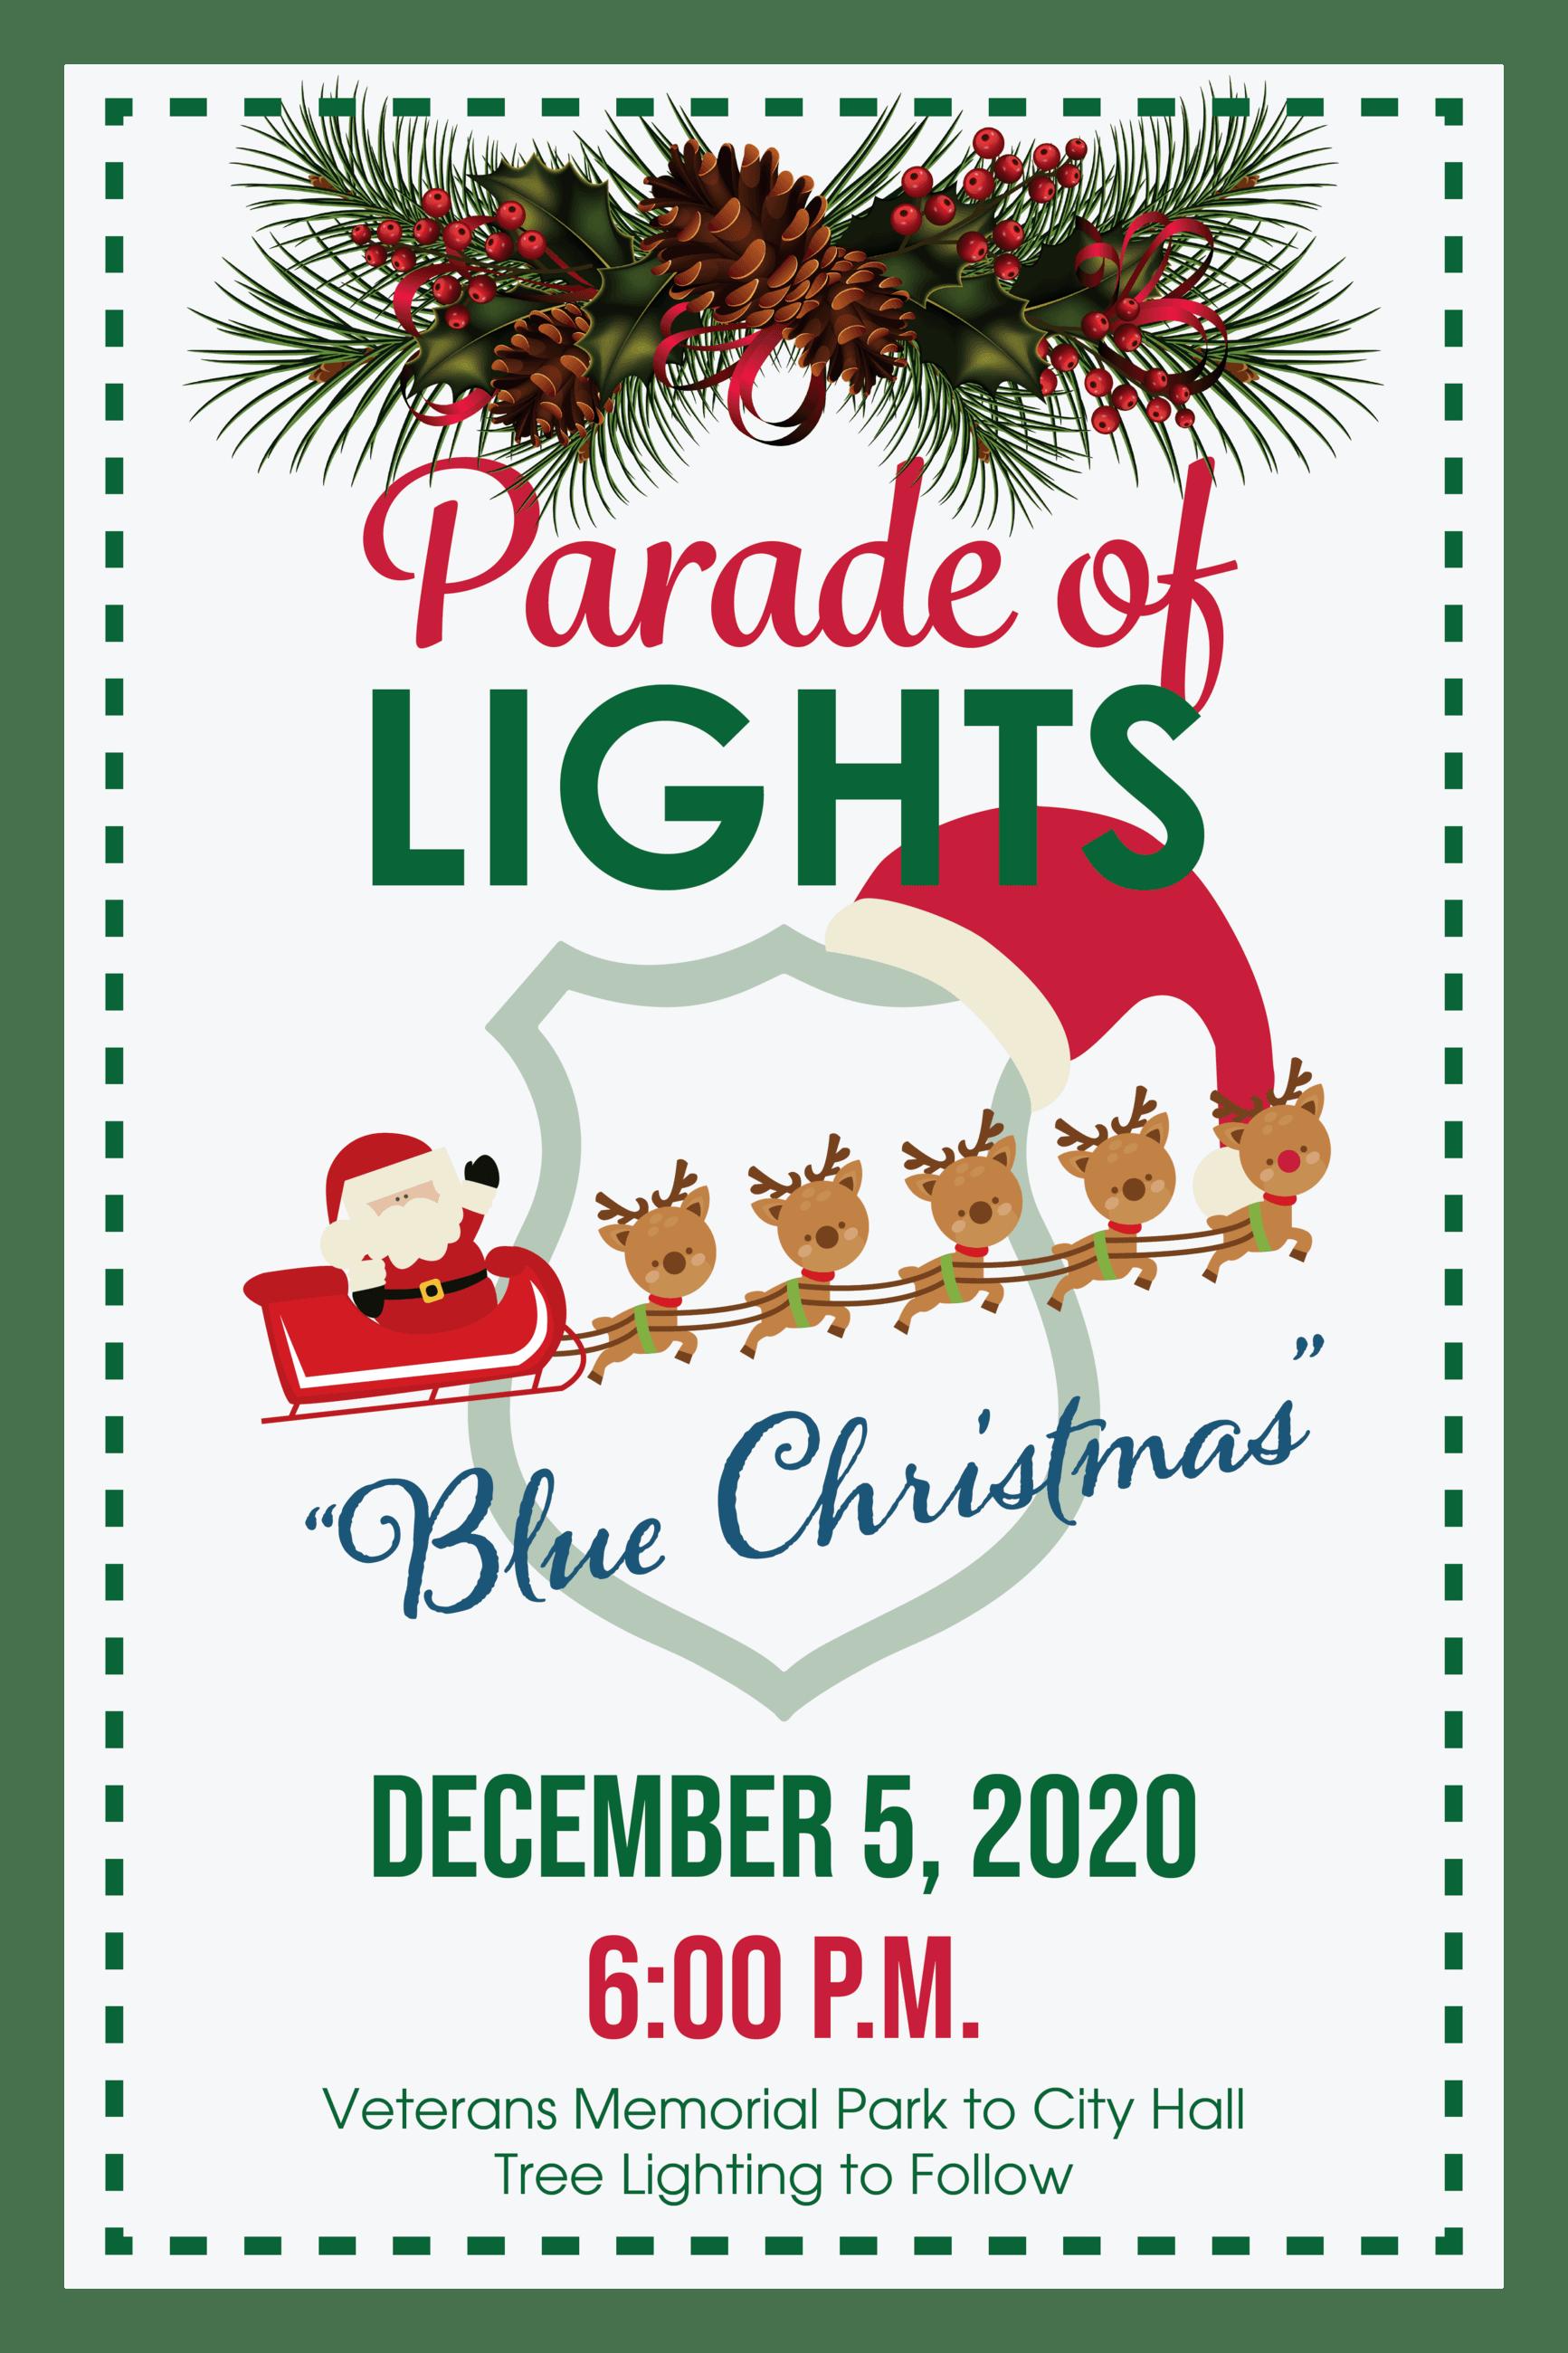 La Vergne Christmas Parade 2020 Parade of Lights | La Vergne, TN